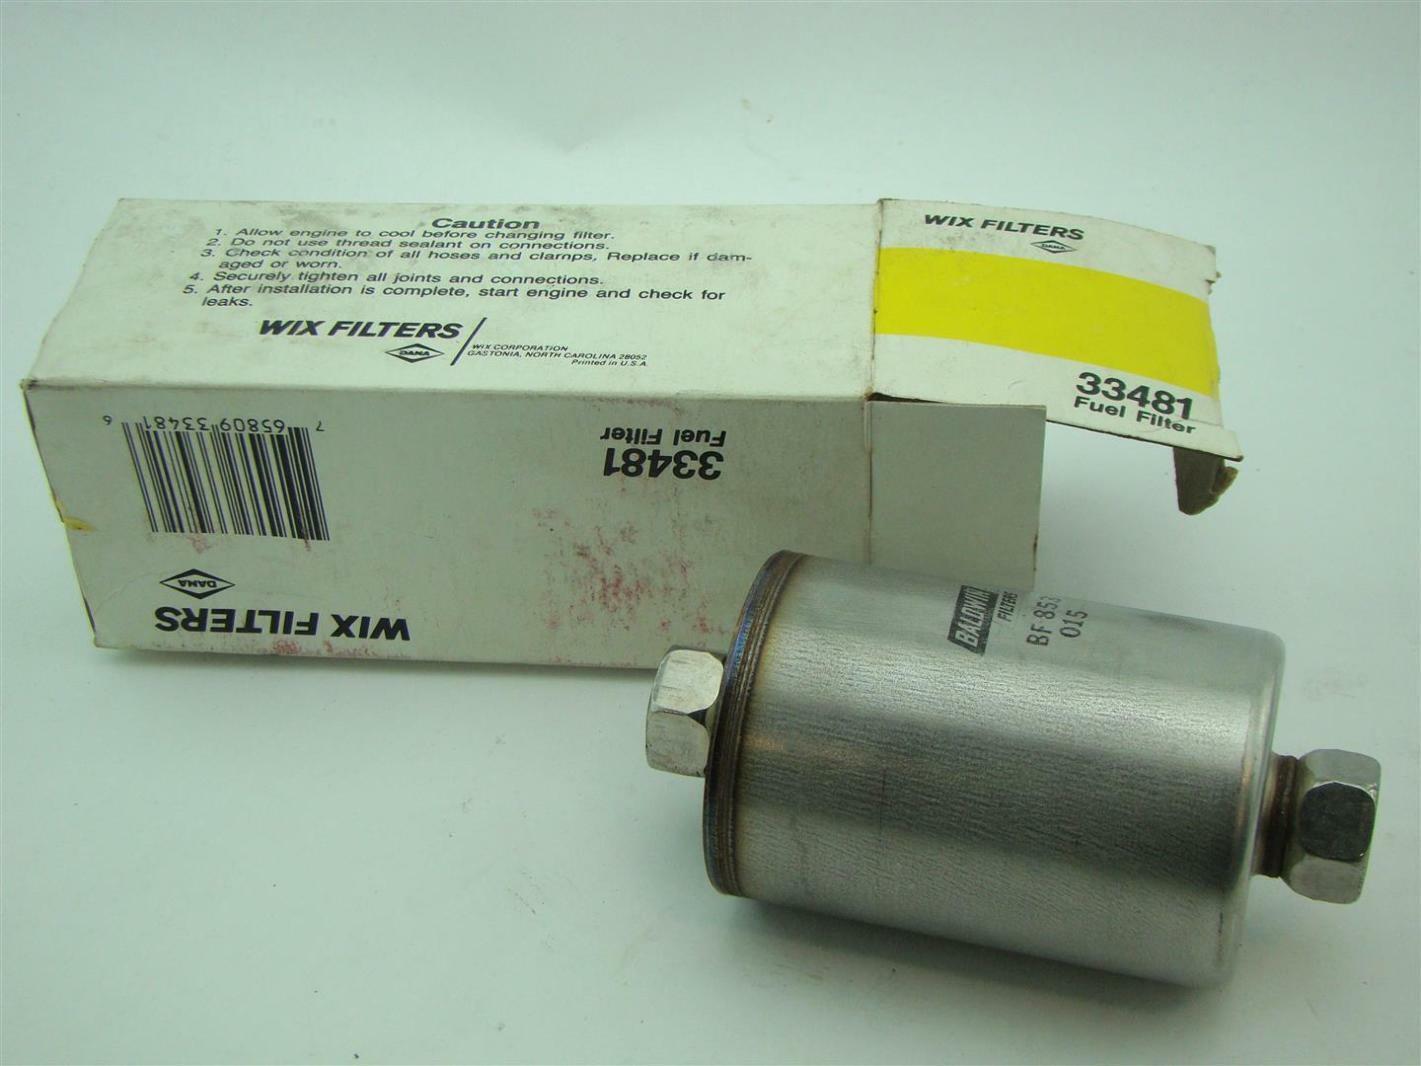 Baldwin Fuel Filter BF853 | Joseph Fazzio, Incorporated on baldwin lamps, baldwin cross reference chart, baldwin hardware, baldwin seahawks 29, baldwin amplifiers, baldwin diesel, baldwin interchange fleet quick cross,